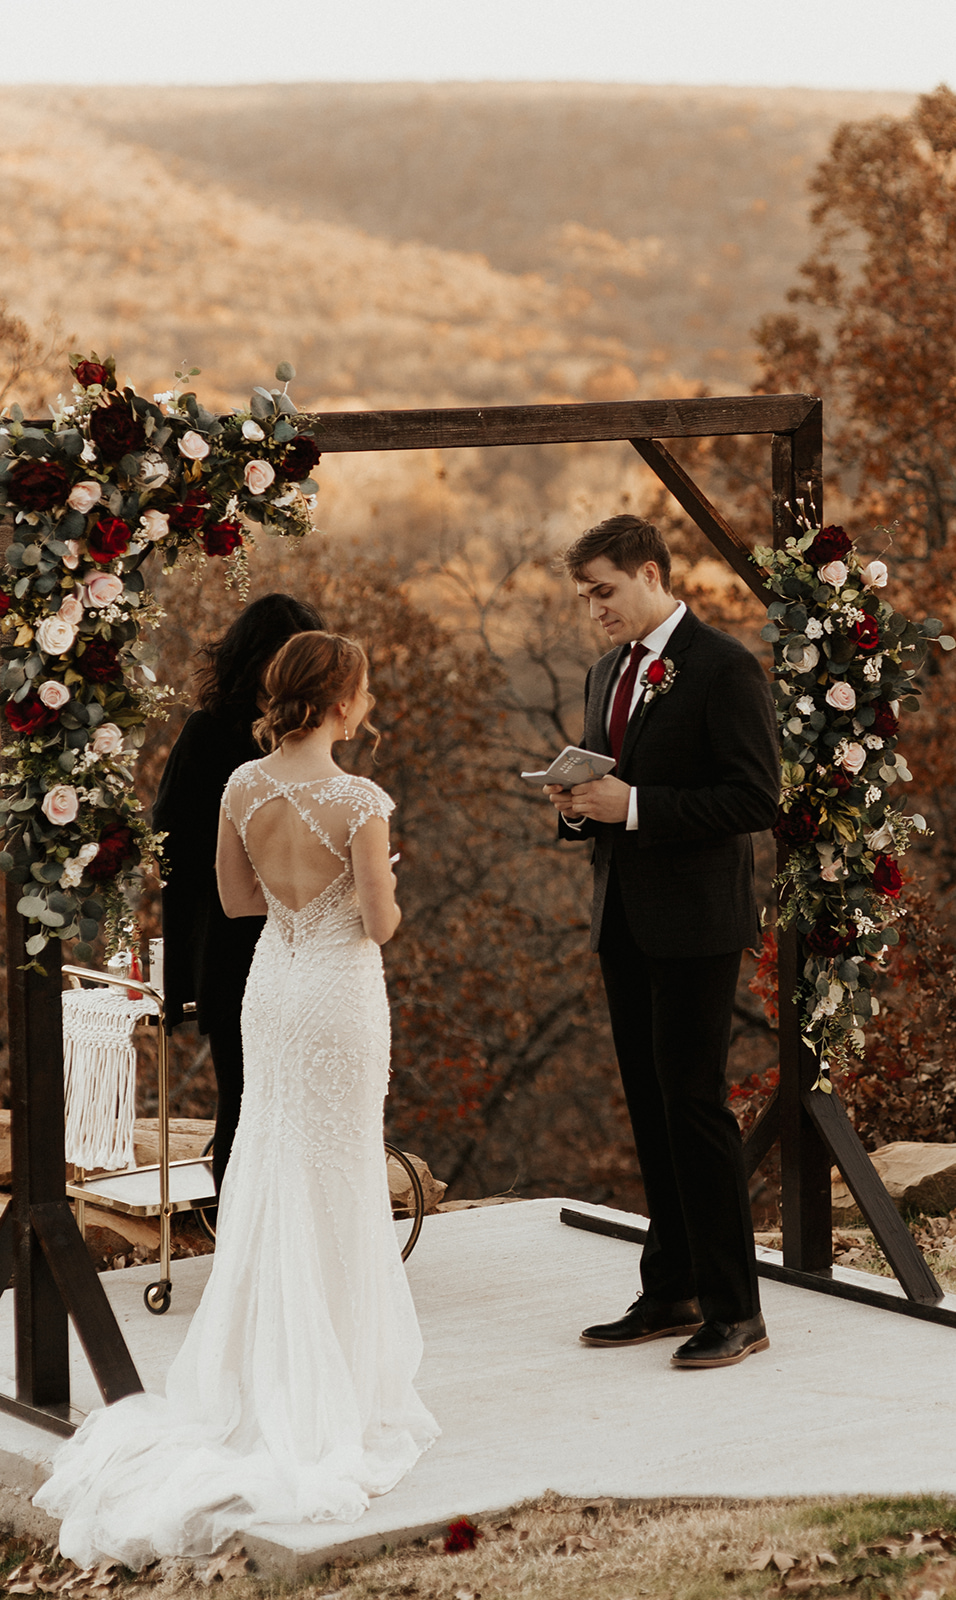 Best Wedding Venue in Tulsa Bixby Dream Point Ranch 52.jpg